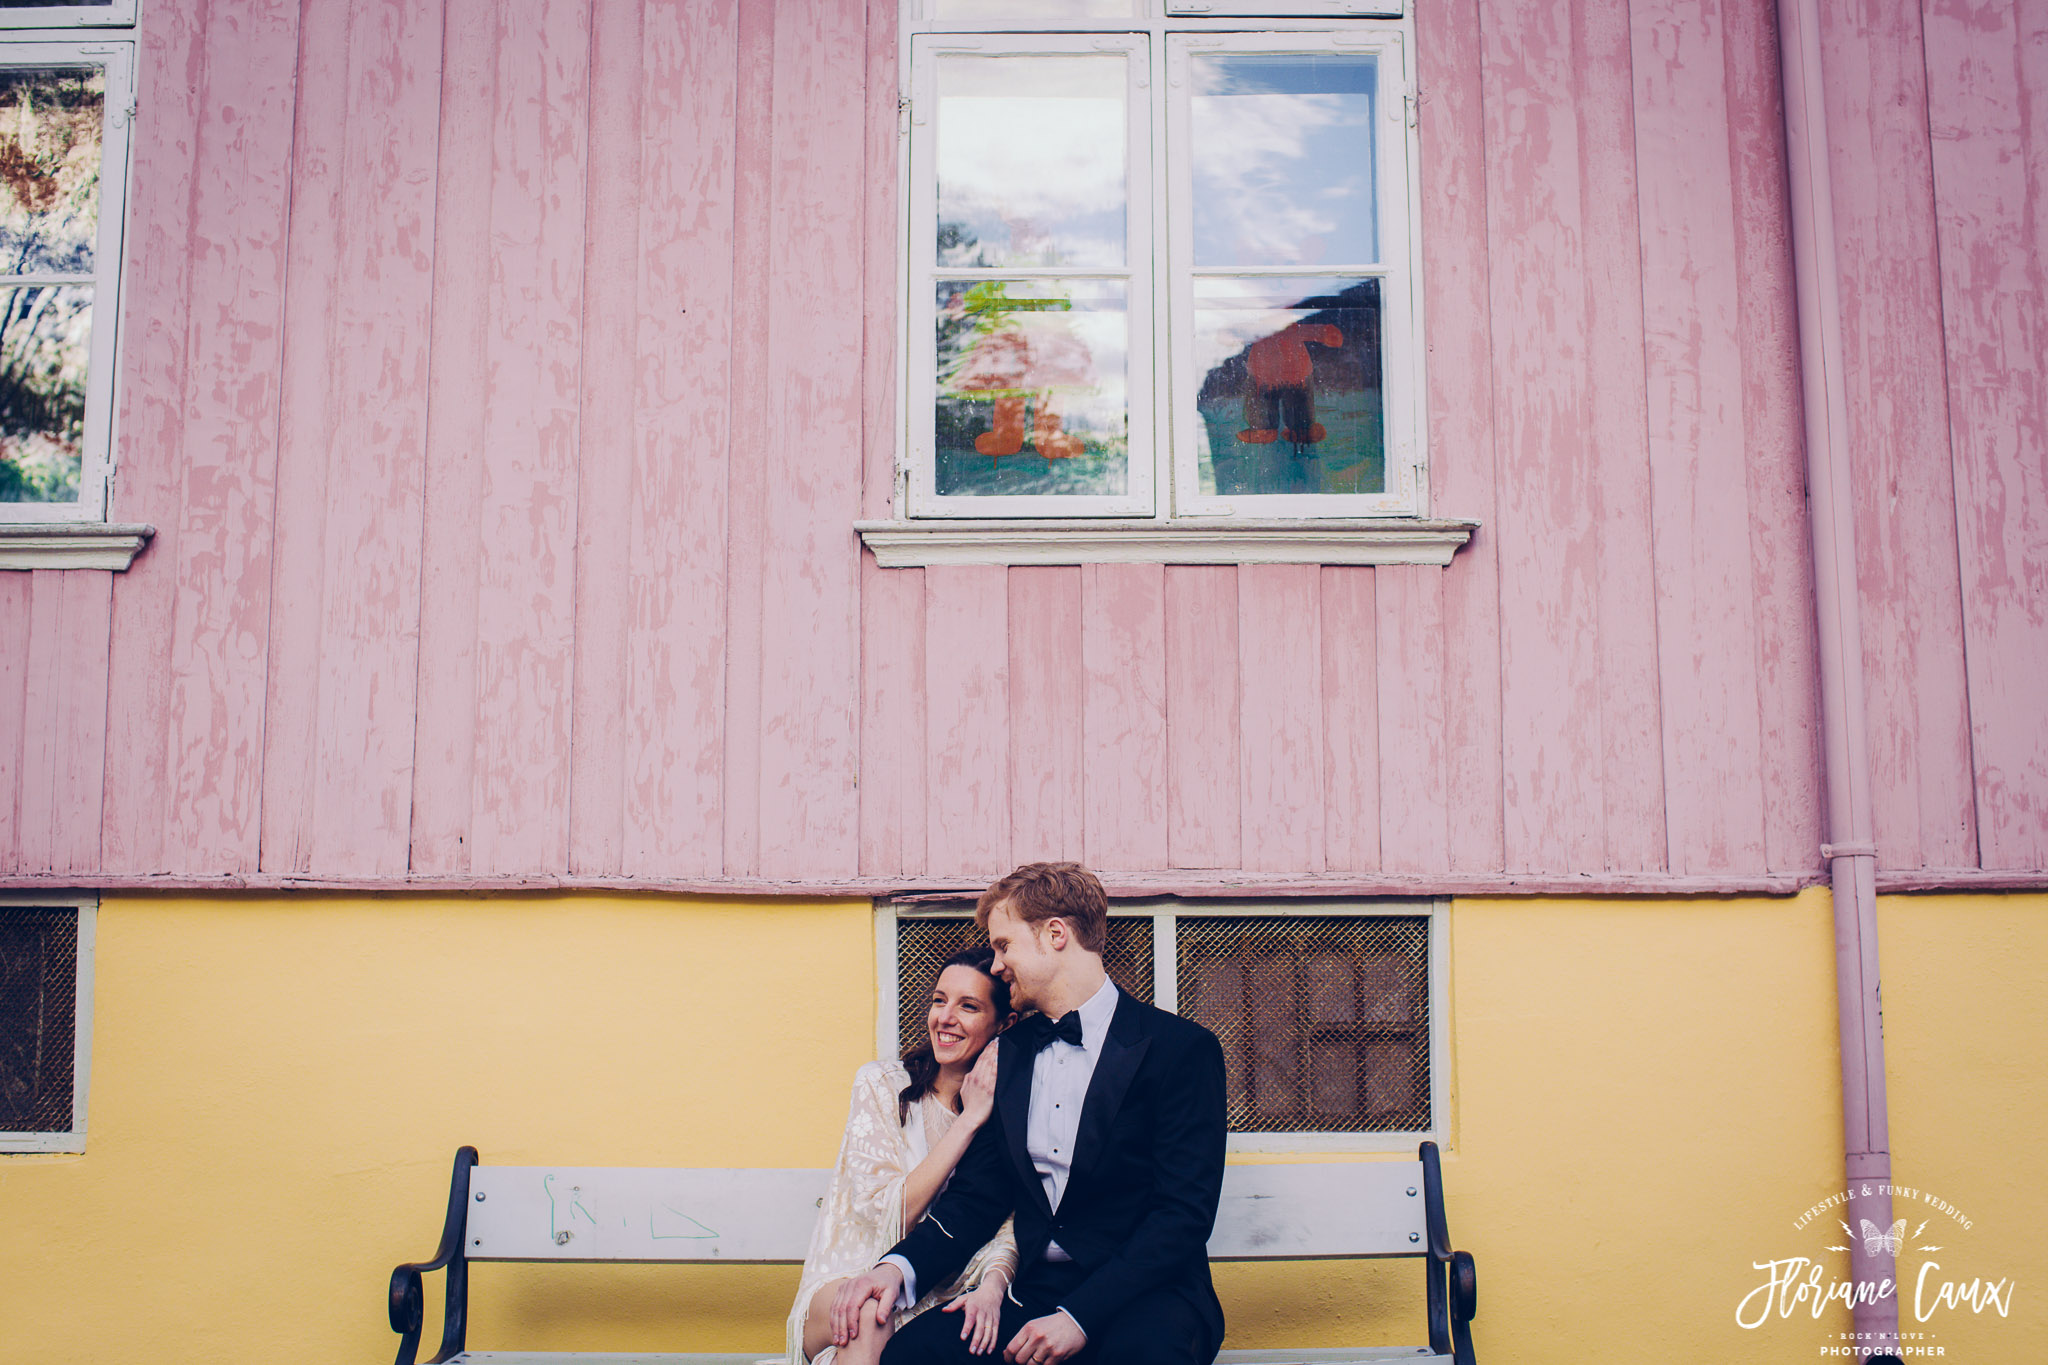 destination-wedding-photographer-oslo-norway-floriane-caux-17